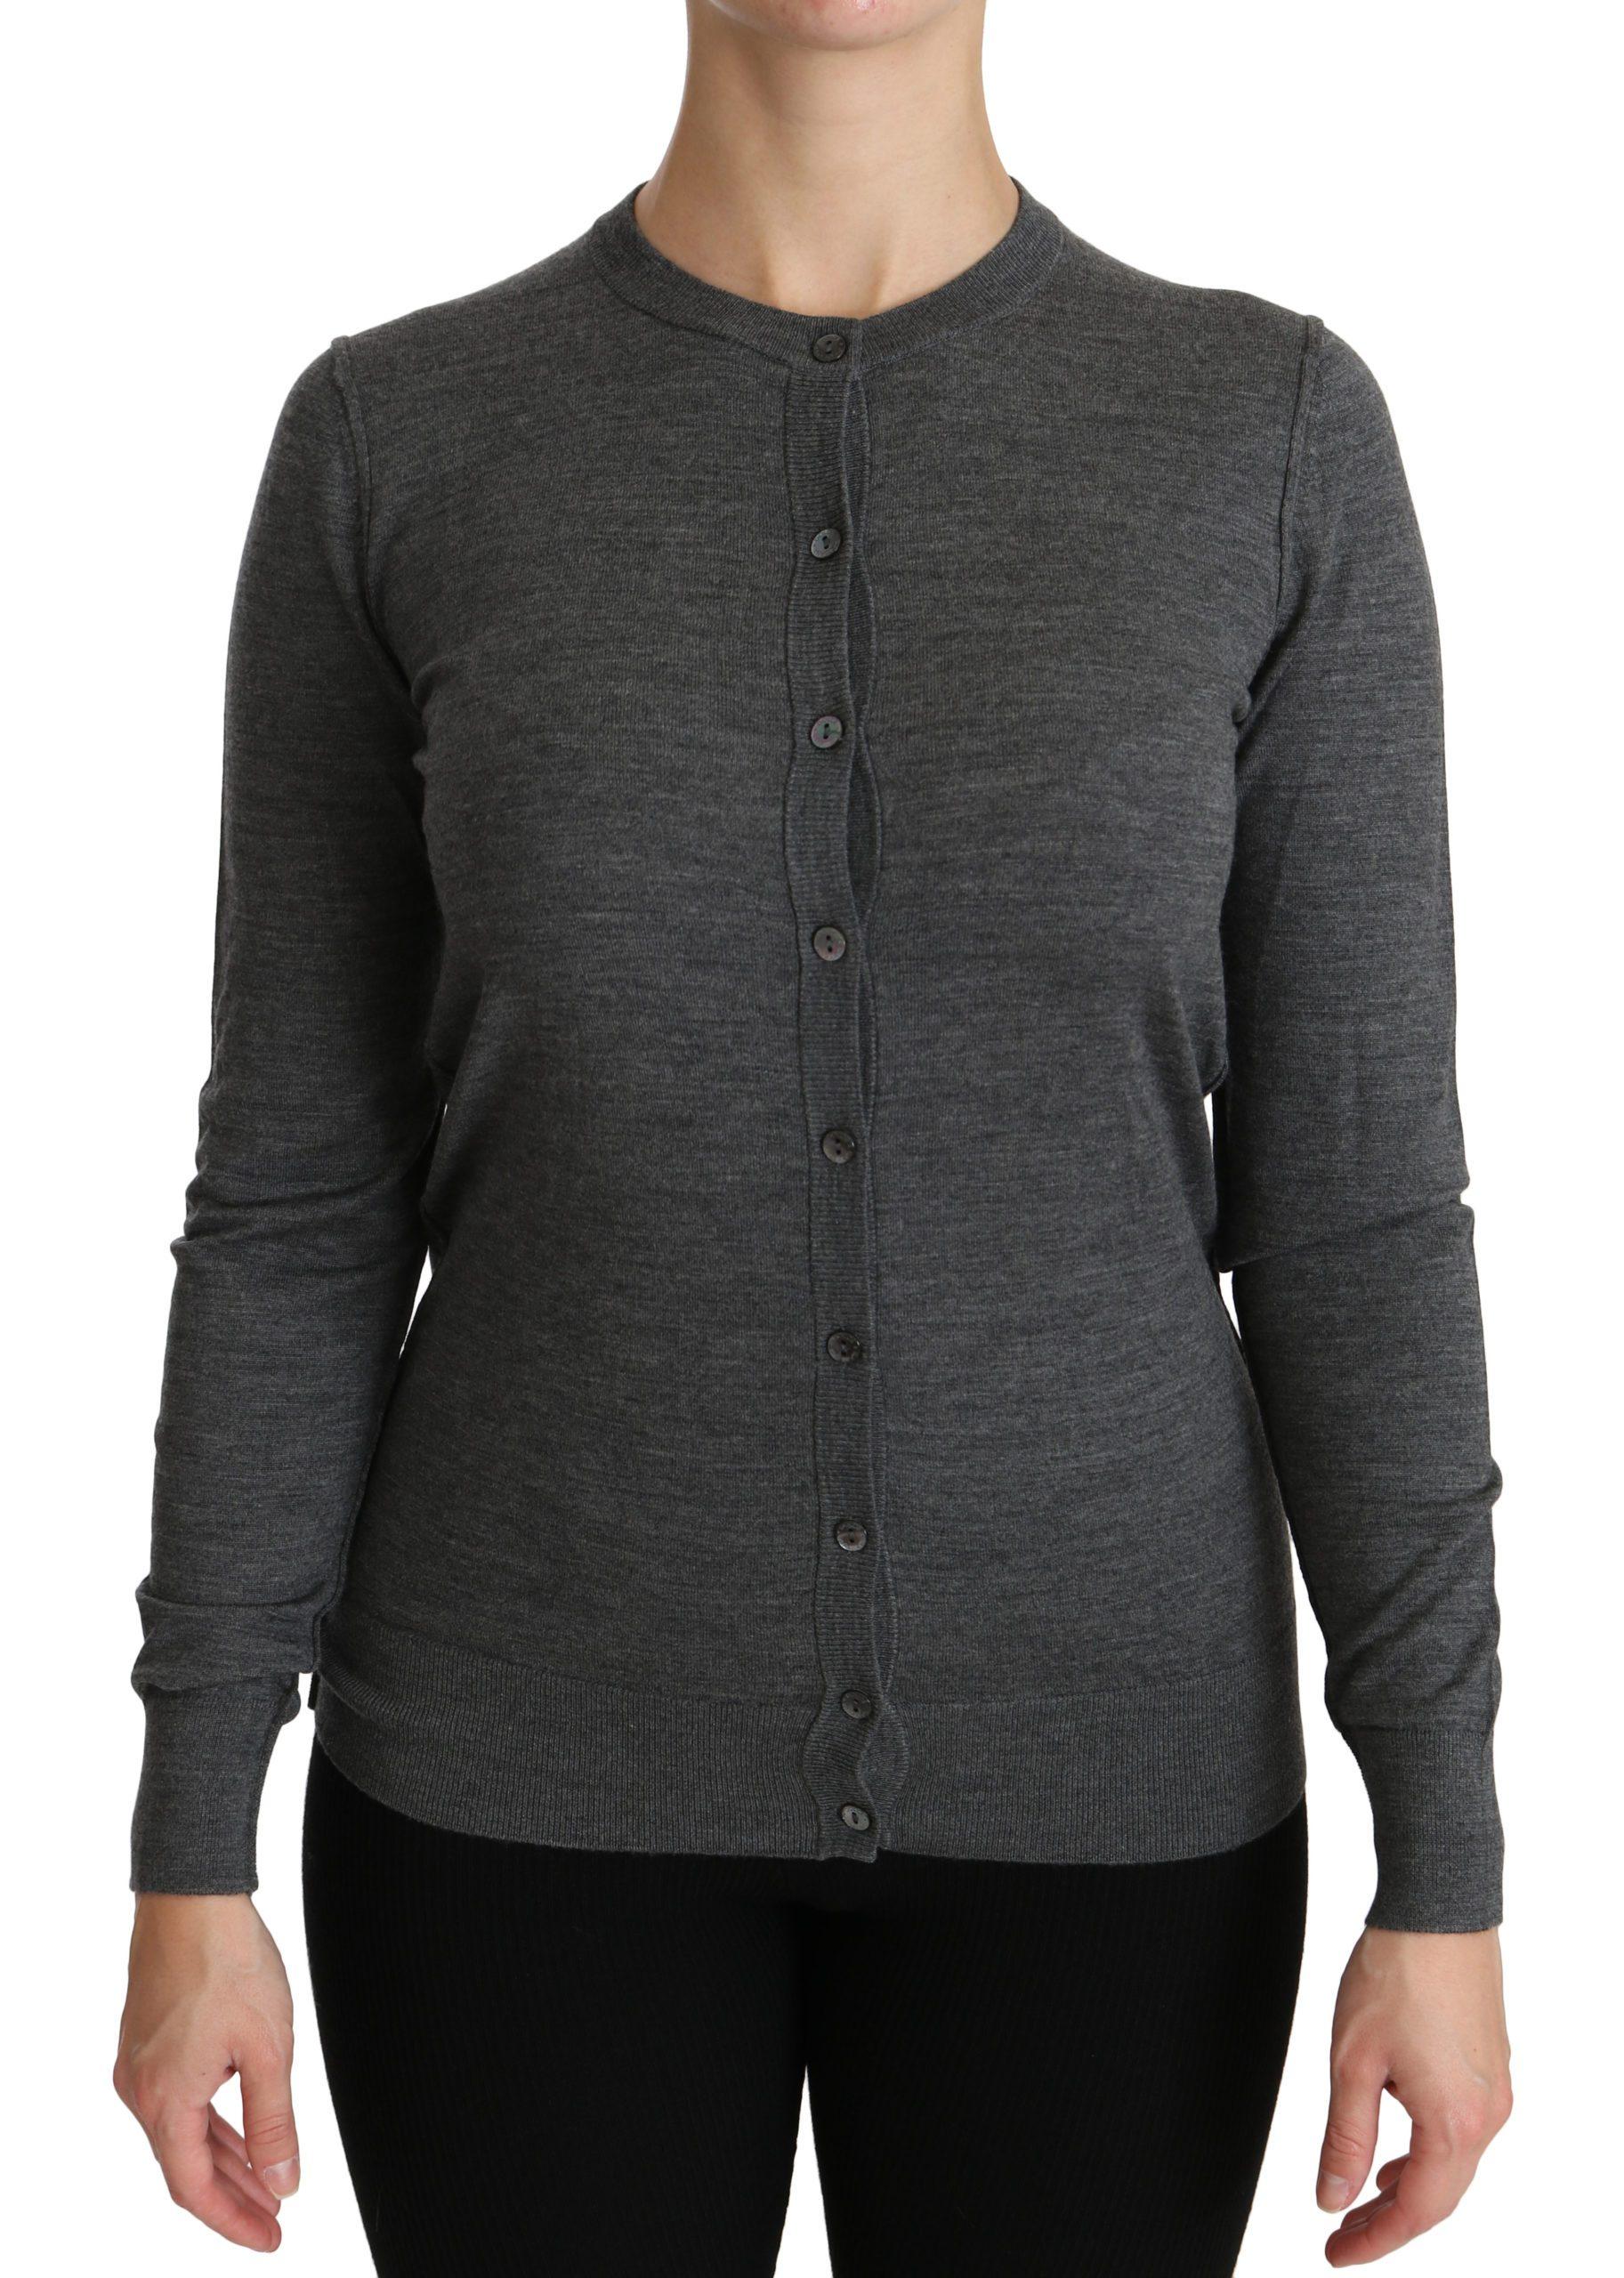 Dolce & Gabbana Women's LS Wool Cardigan Gray TSH4300 - IT38|XS